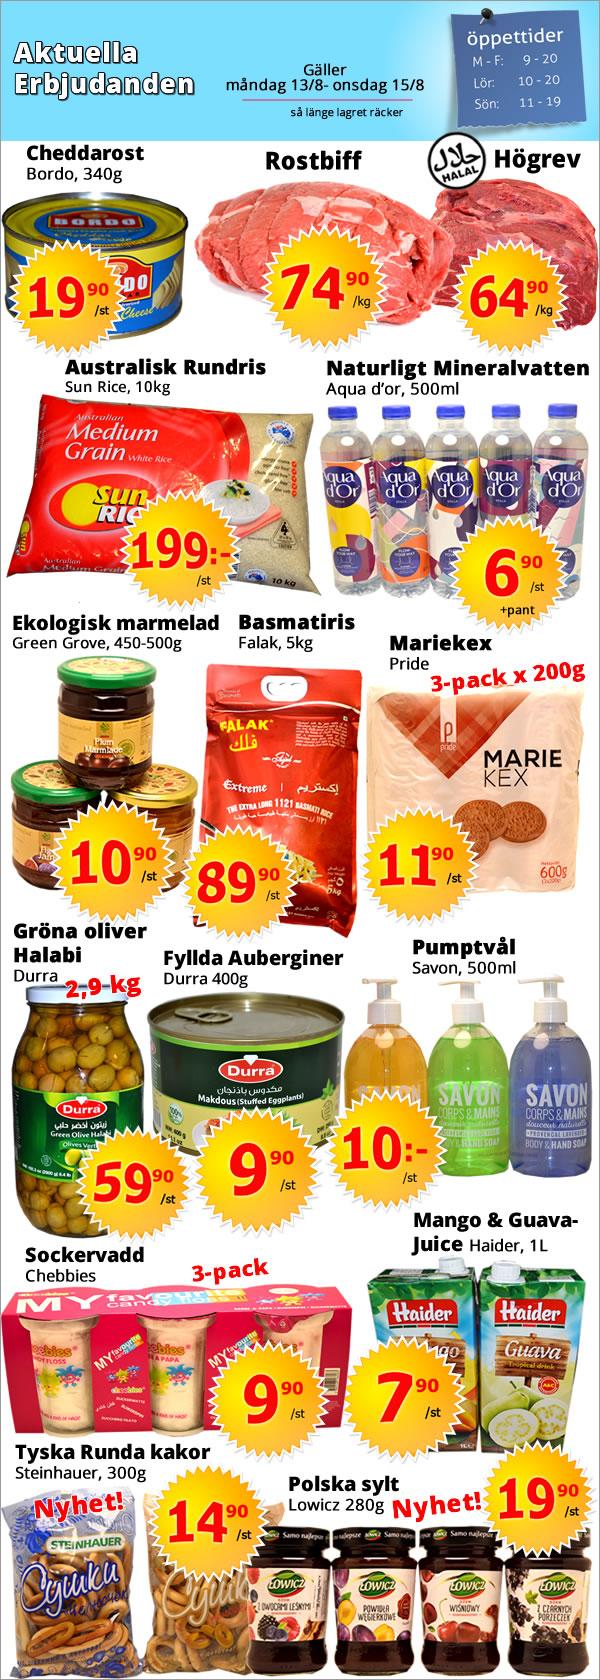 Kista Grossen - Aktuella erbjudanden,basmatiris,jasminris,lammstek,ris, thai food, Indian food